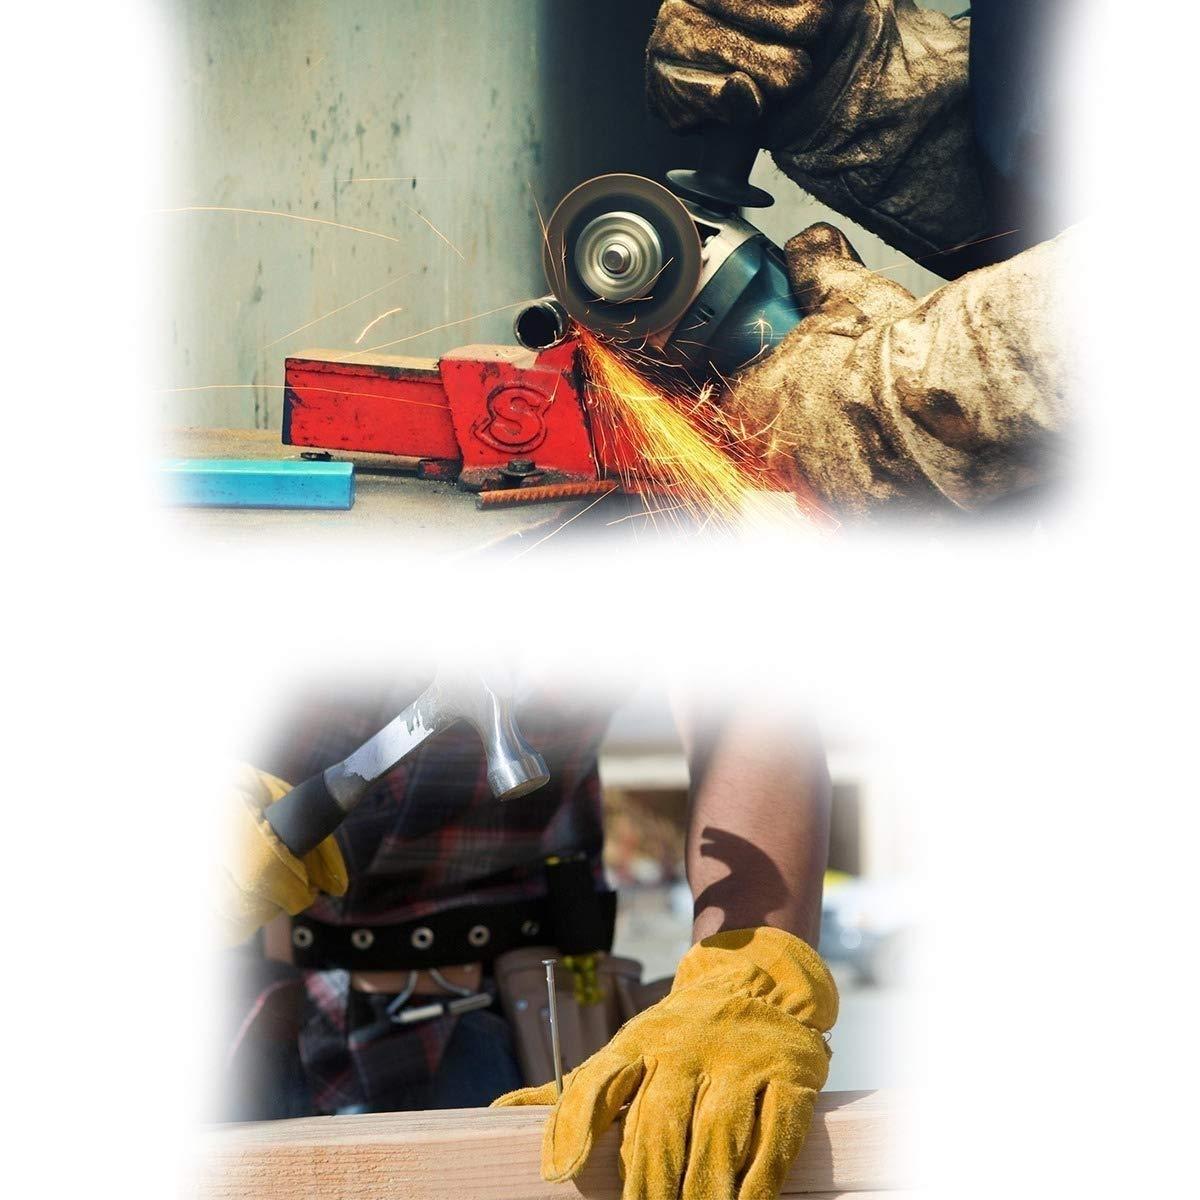 Protective Durable Heat Resistant Welding Gloves